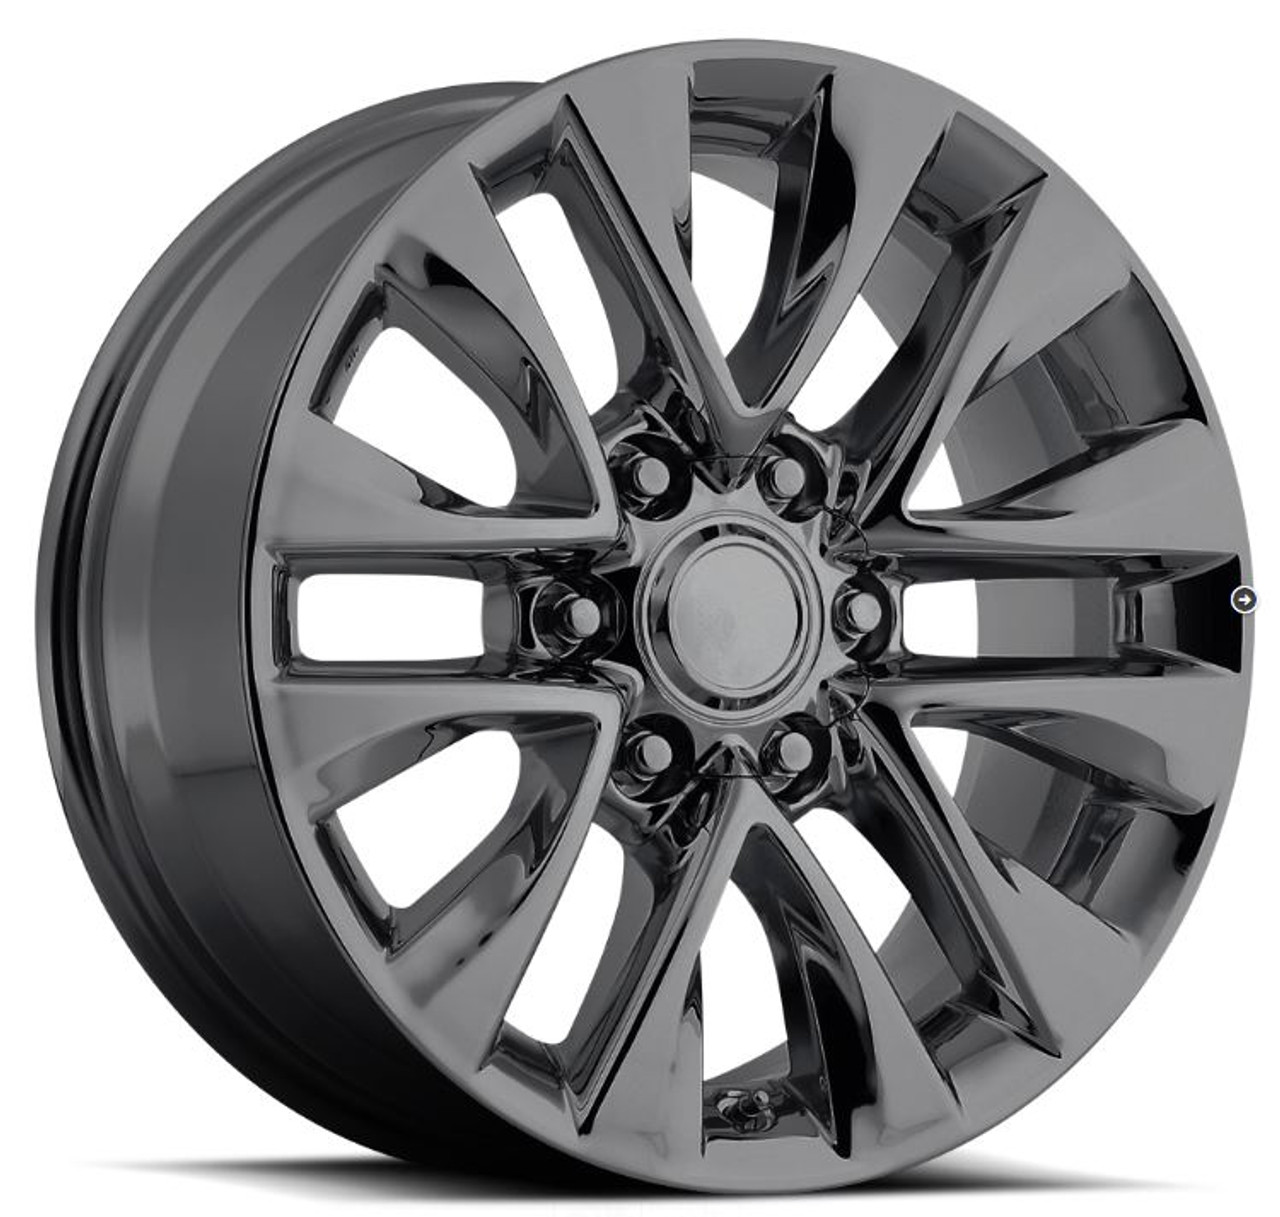 18 Fits Lexus Gx 460 Pvd Black Chrome Wheels Rims Set Of 4 18x7 5 Rims Stock Wheel Solutions